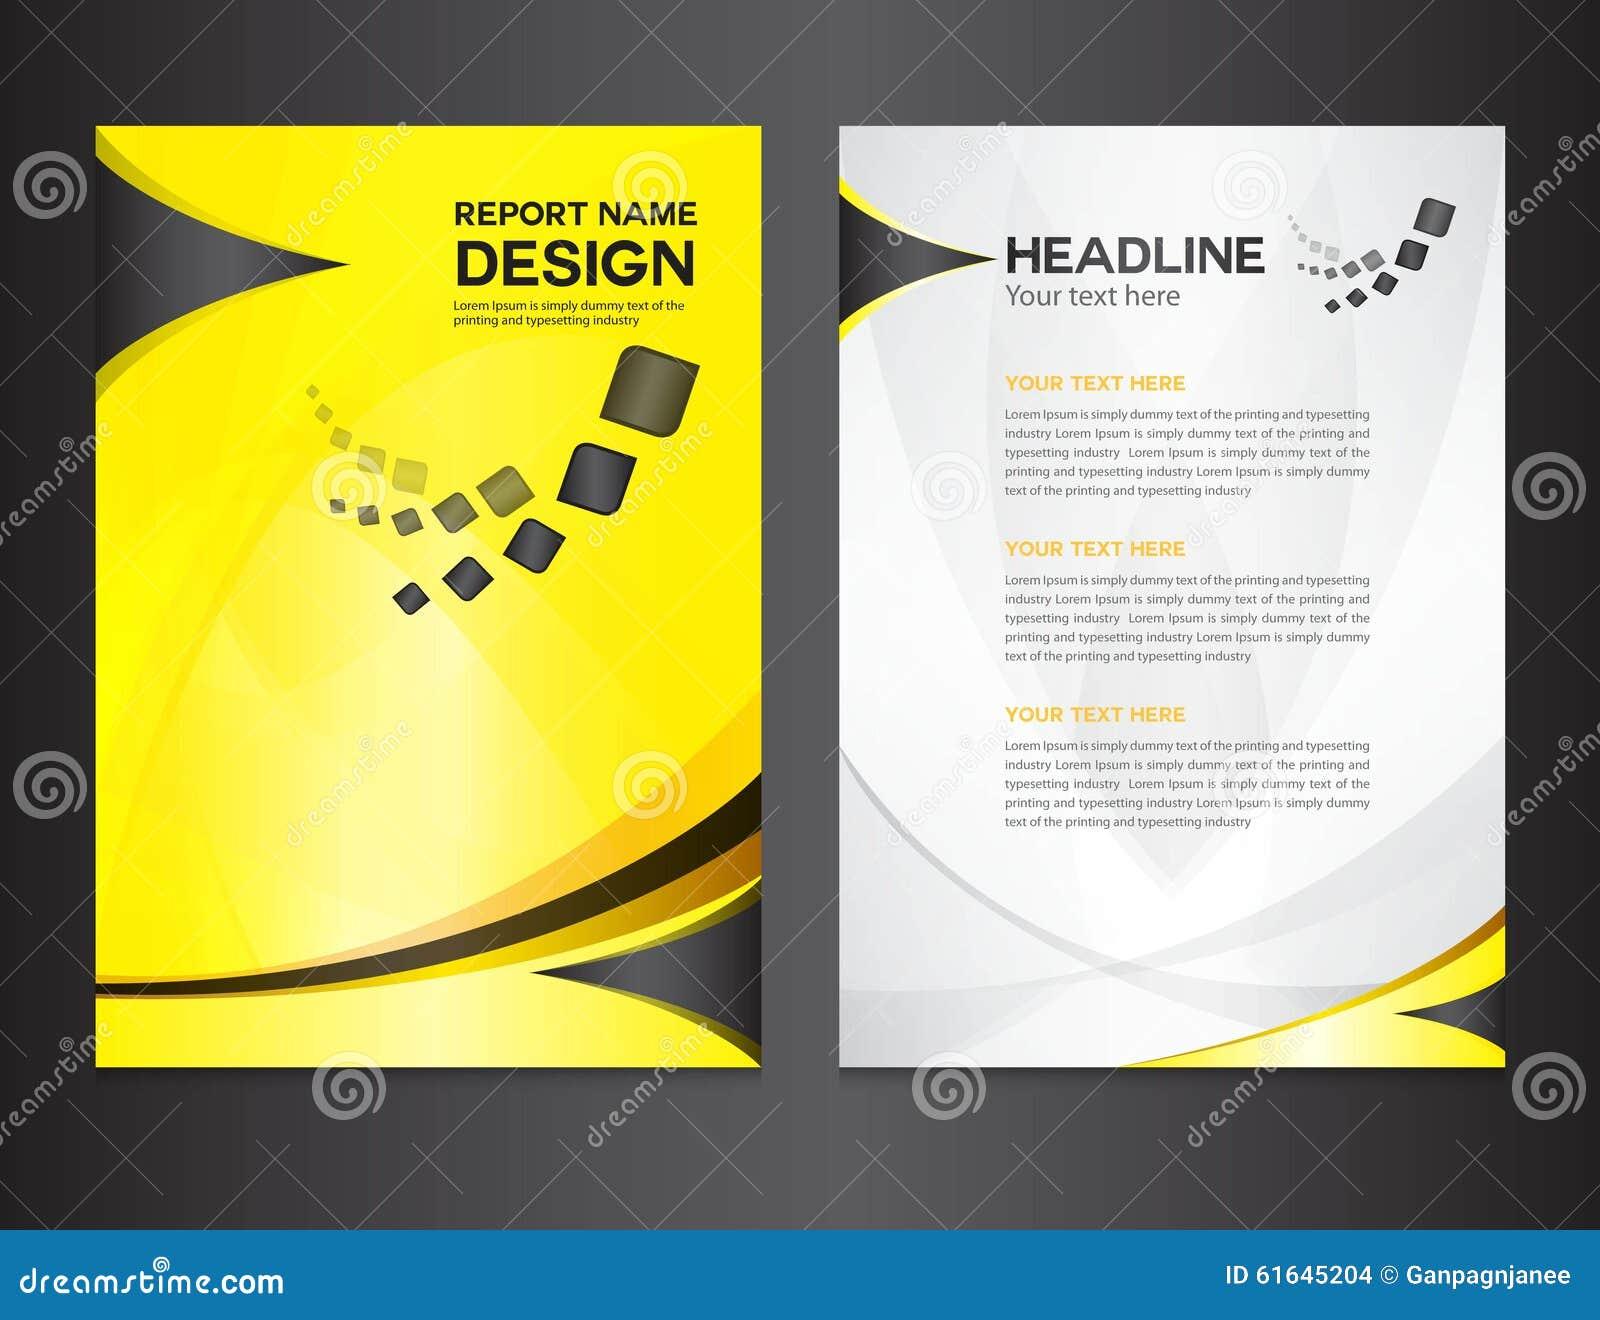 Yellow Book Cover Design : Yellow cover annual report design vector illustration